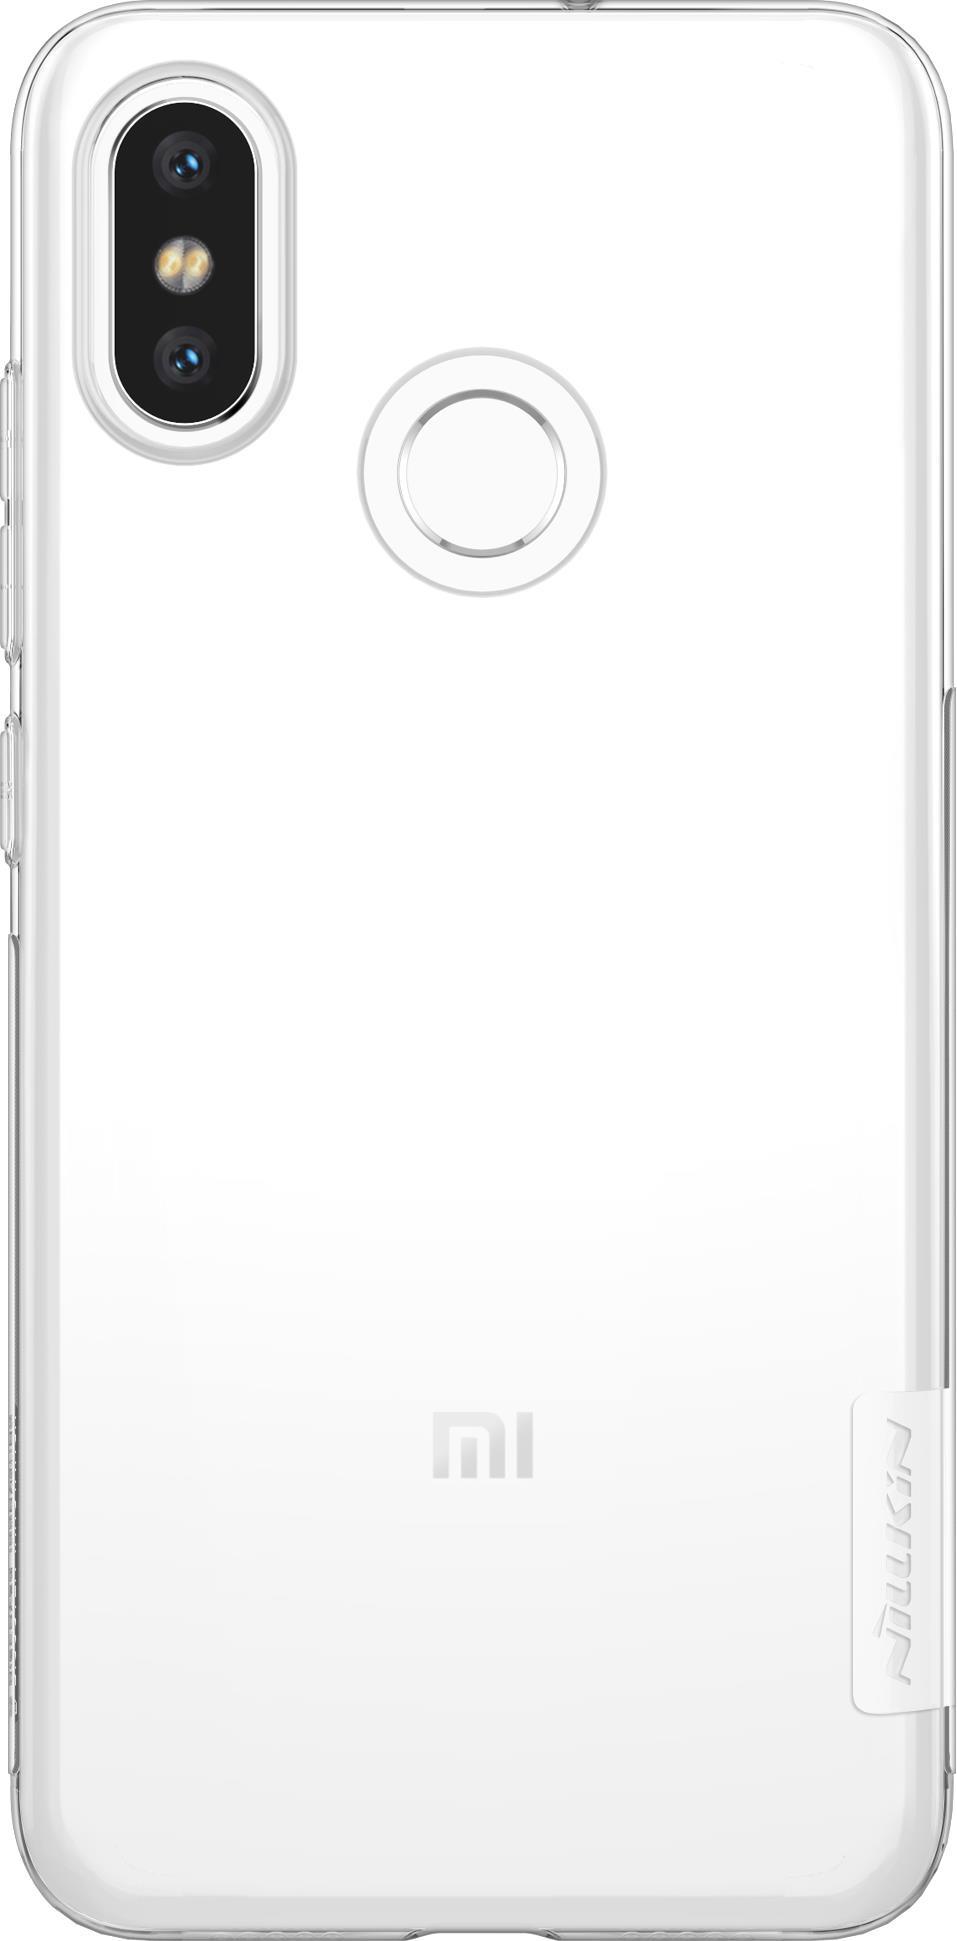 Накладка Nillkin TPU для Xiaomi Mi 8, 6902048159358, белый силиконовая накладка nillkin для xiaomi mi a2 white